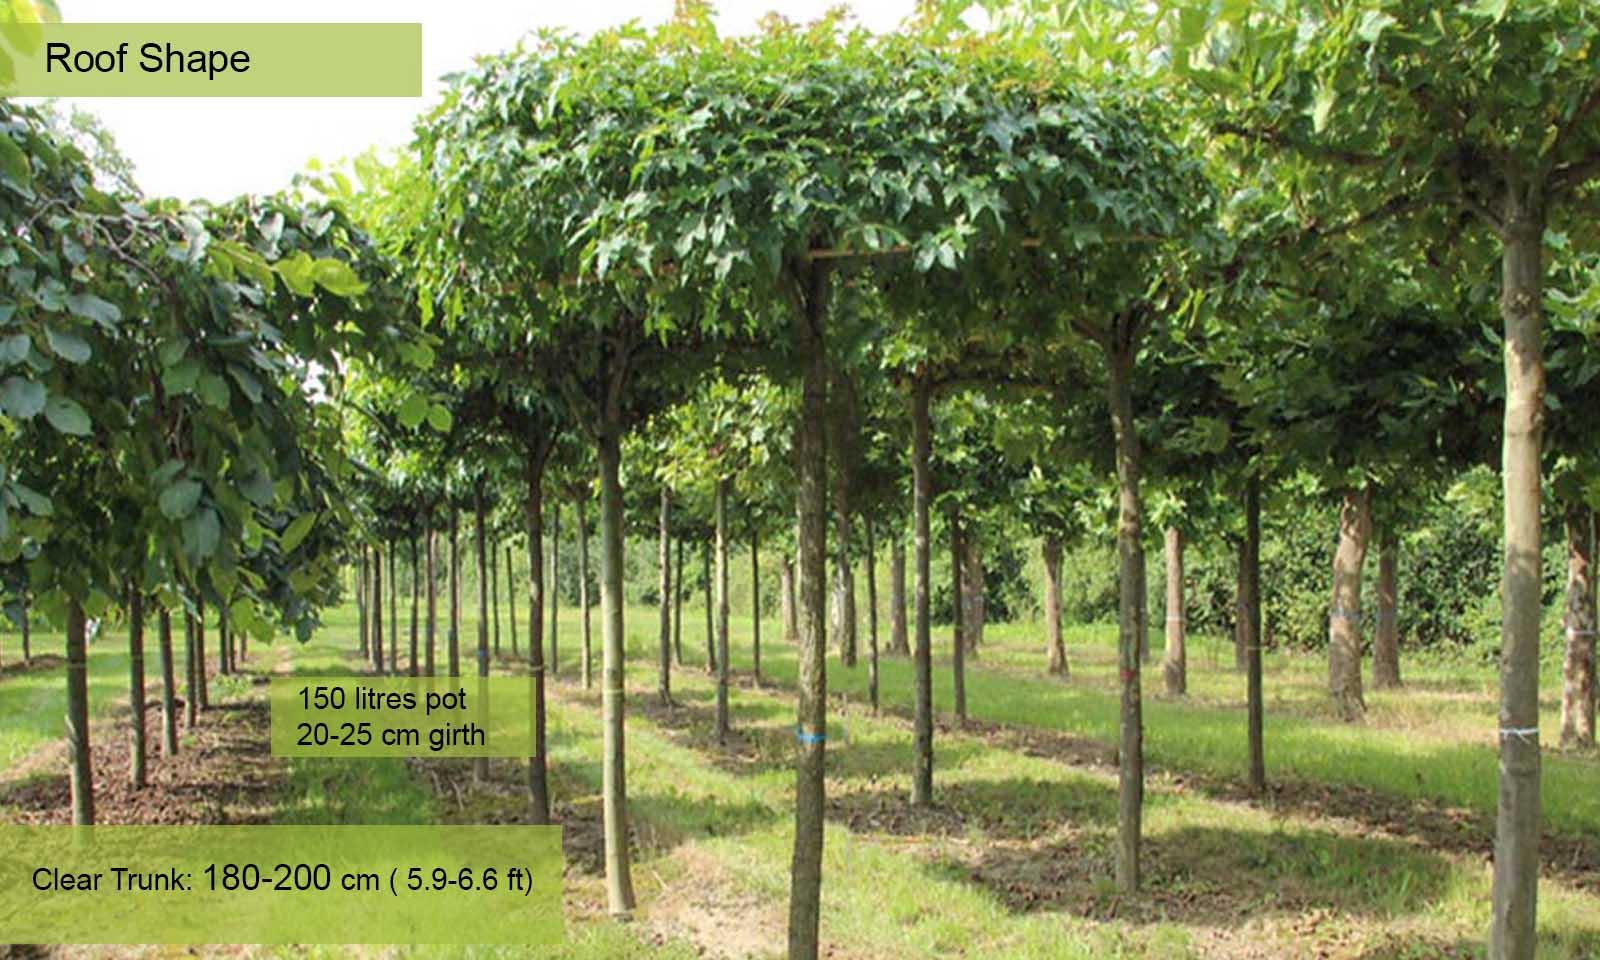 Liquidambar Styraciflua Sweet Gum Tree Roof Shape